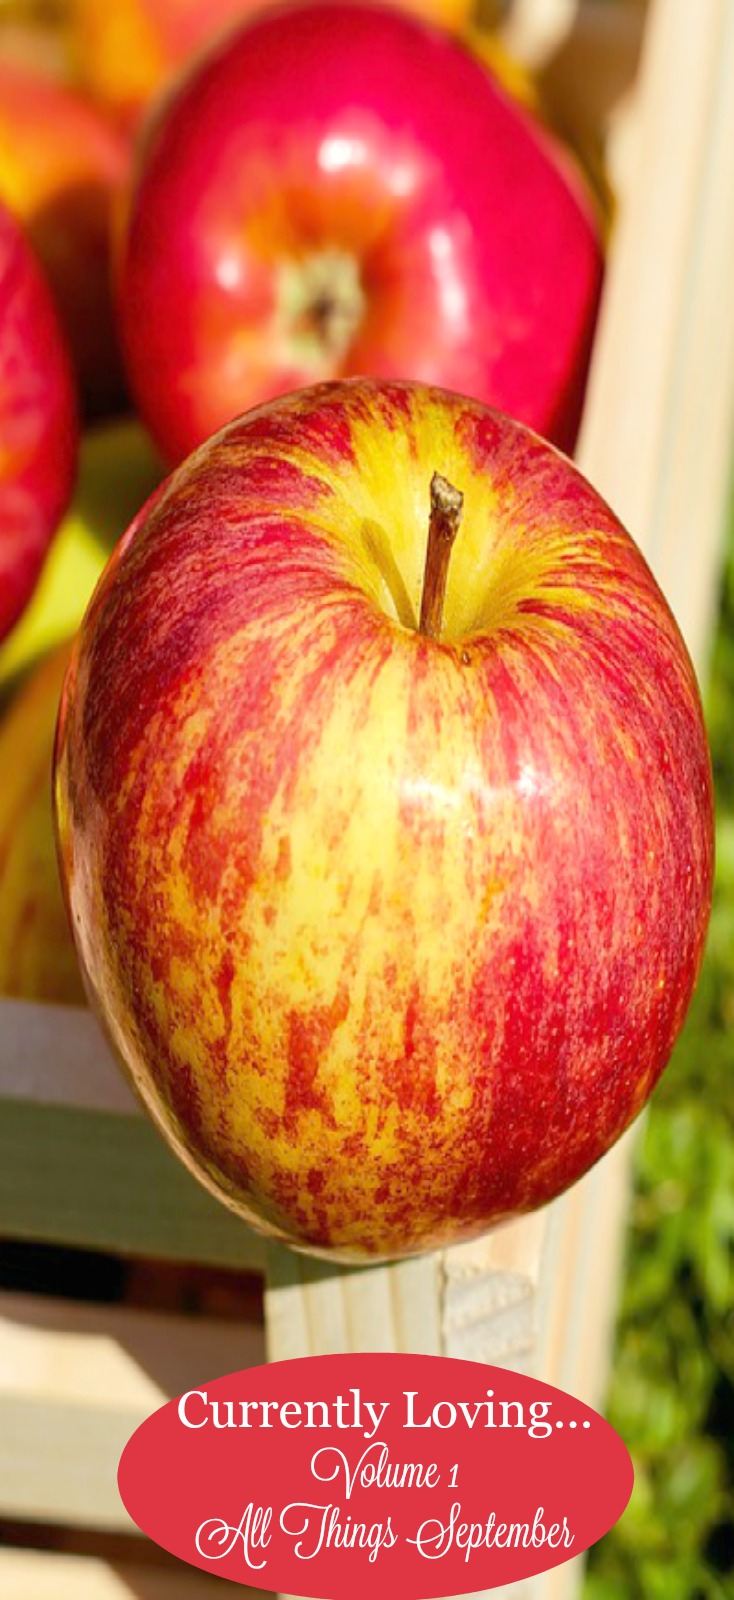 Currently loving...apple season! on chemistrycachet.com